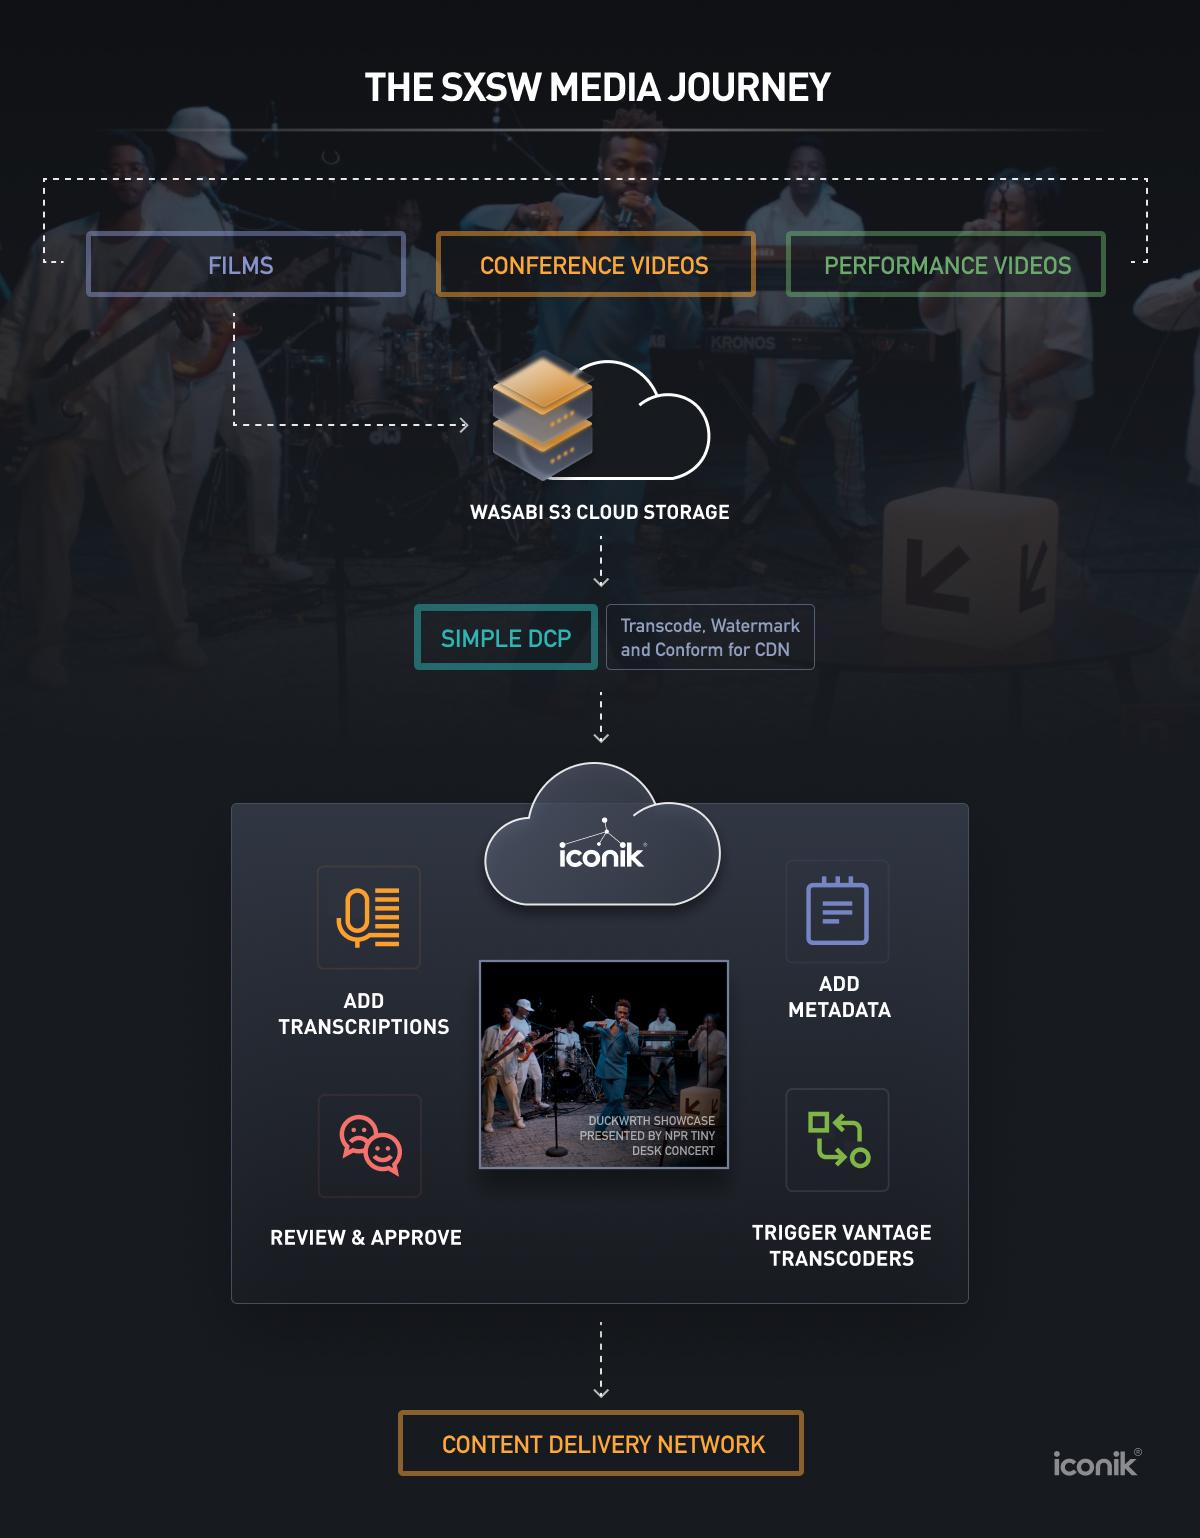 SXSW 2021 online media workflow with iconik